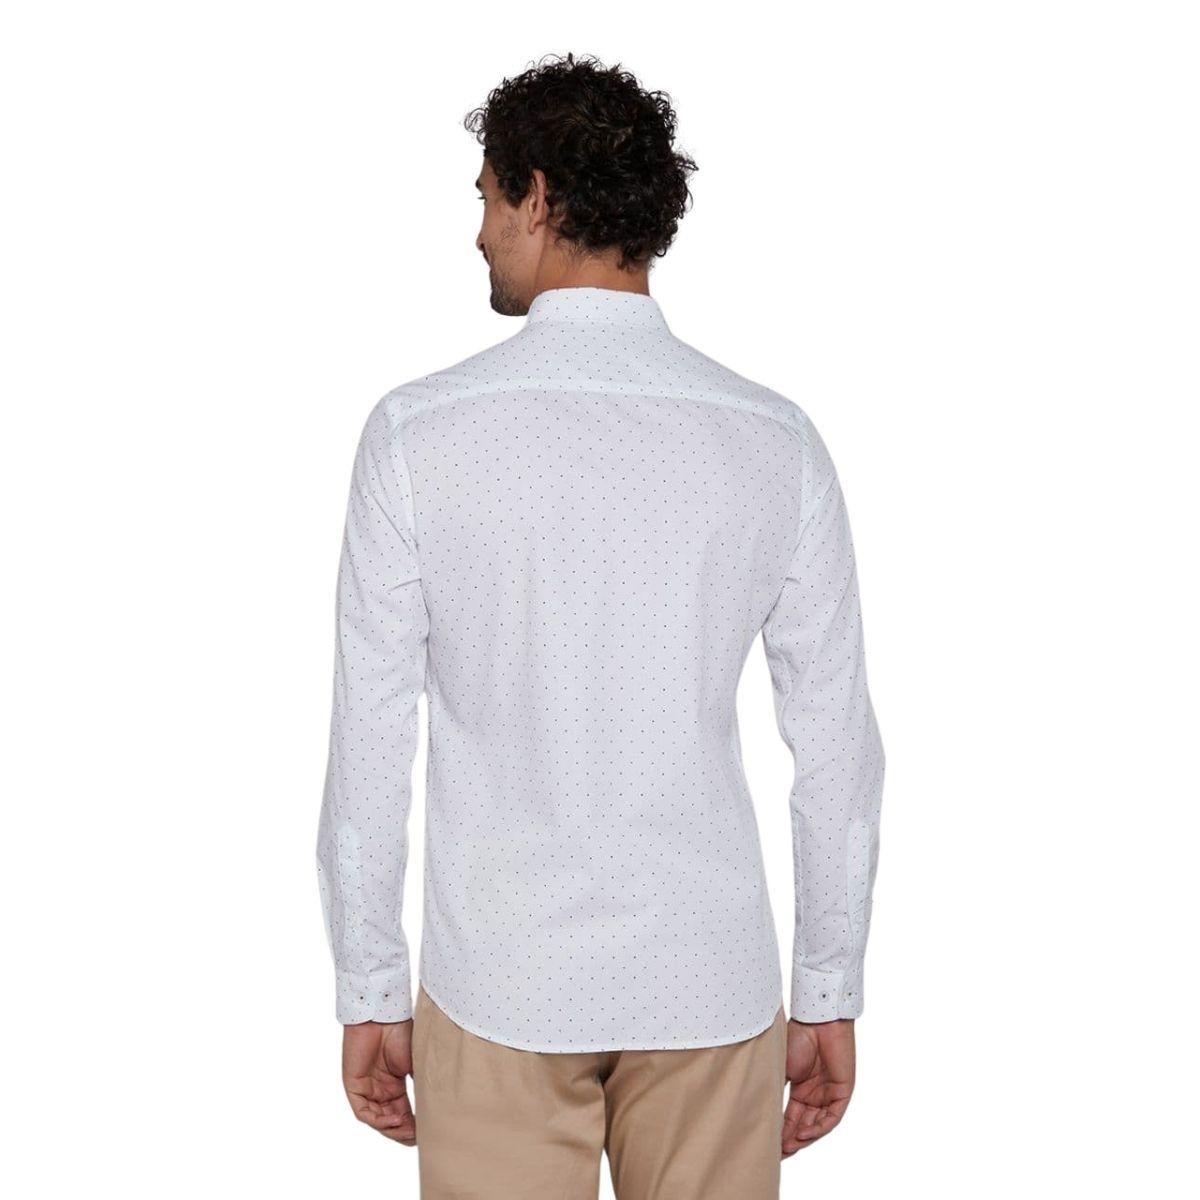 Camisa Individual Manga Longa Concept Fit Poa